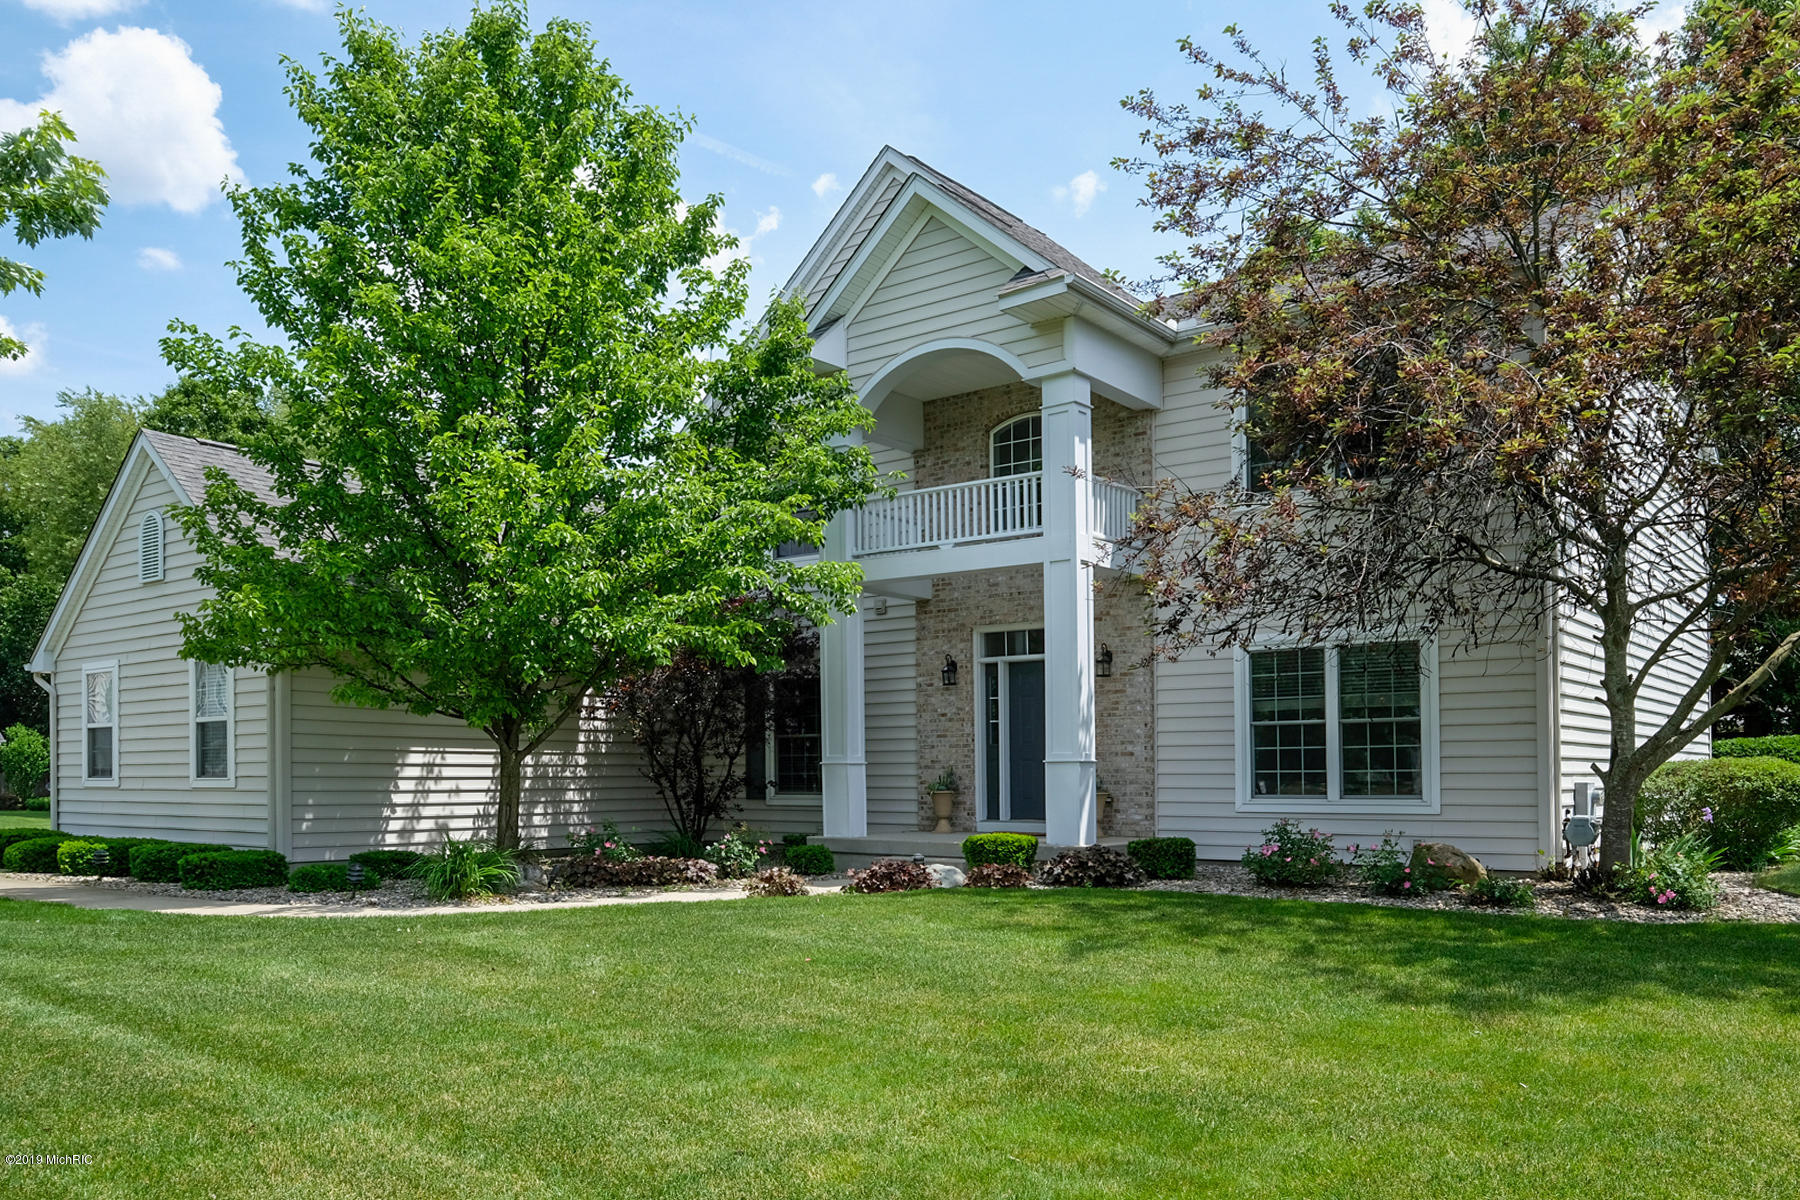 6513 Belgian Avenue, Kalamazoo, Michigan 49009, 4 Bedrooms Bedrooms, ,4 BathroomsBathrooms,Residential,For Sale,Belgian,19027151